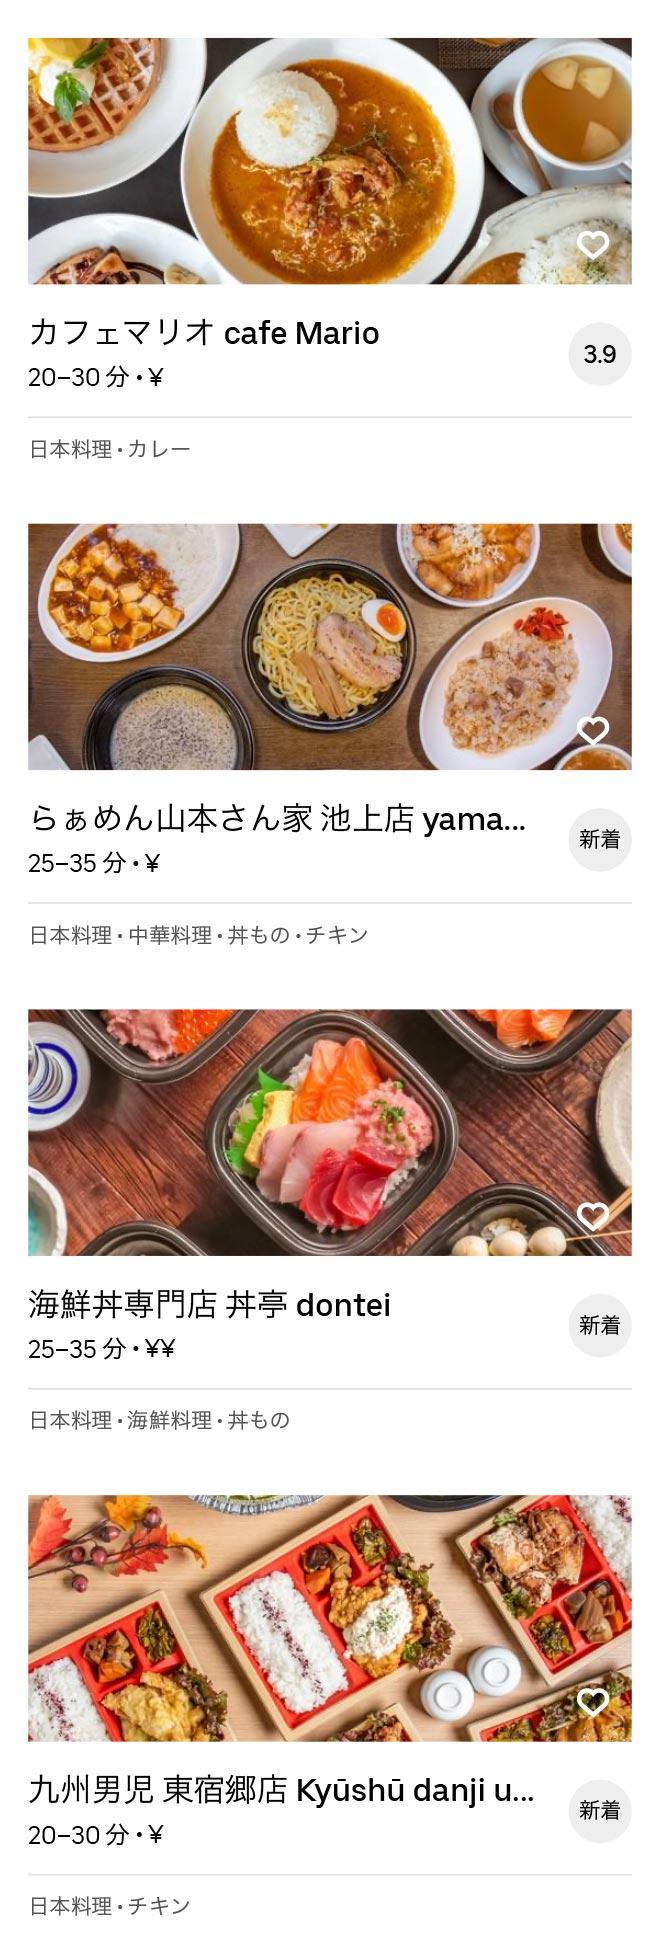 Utsunomiya menu 200608